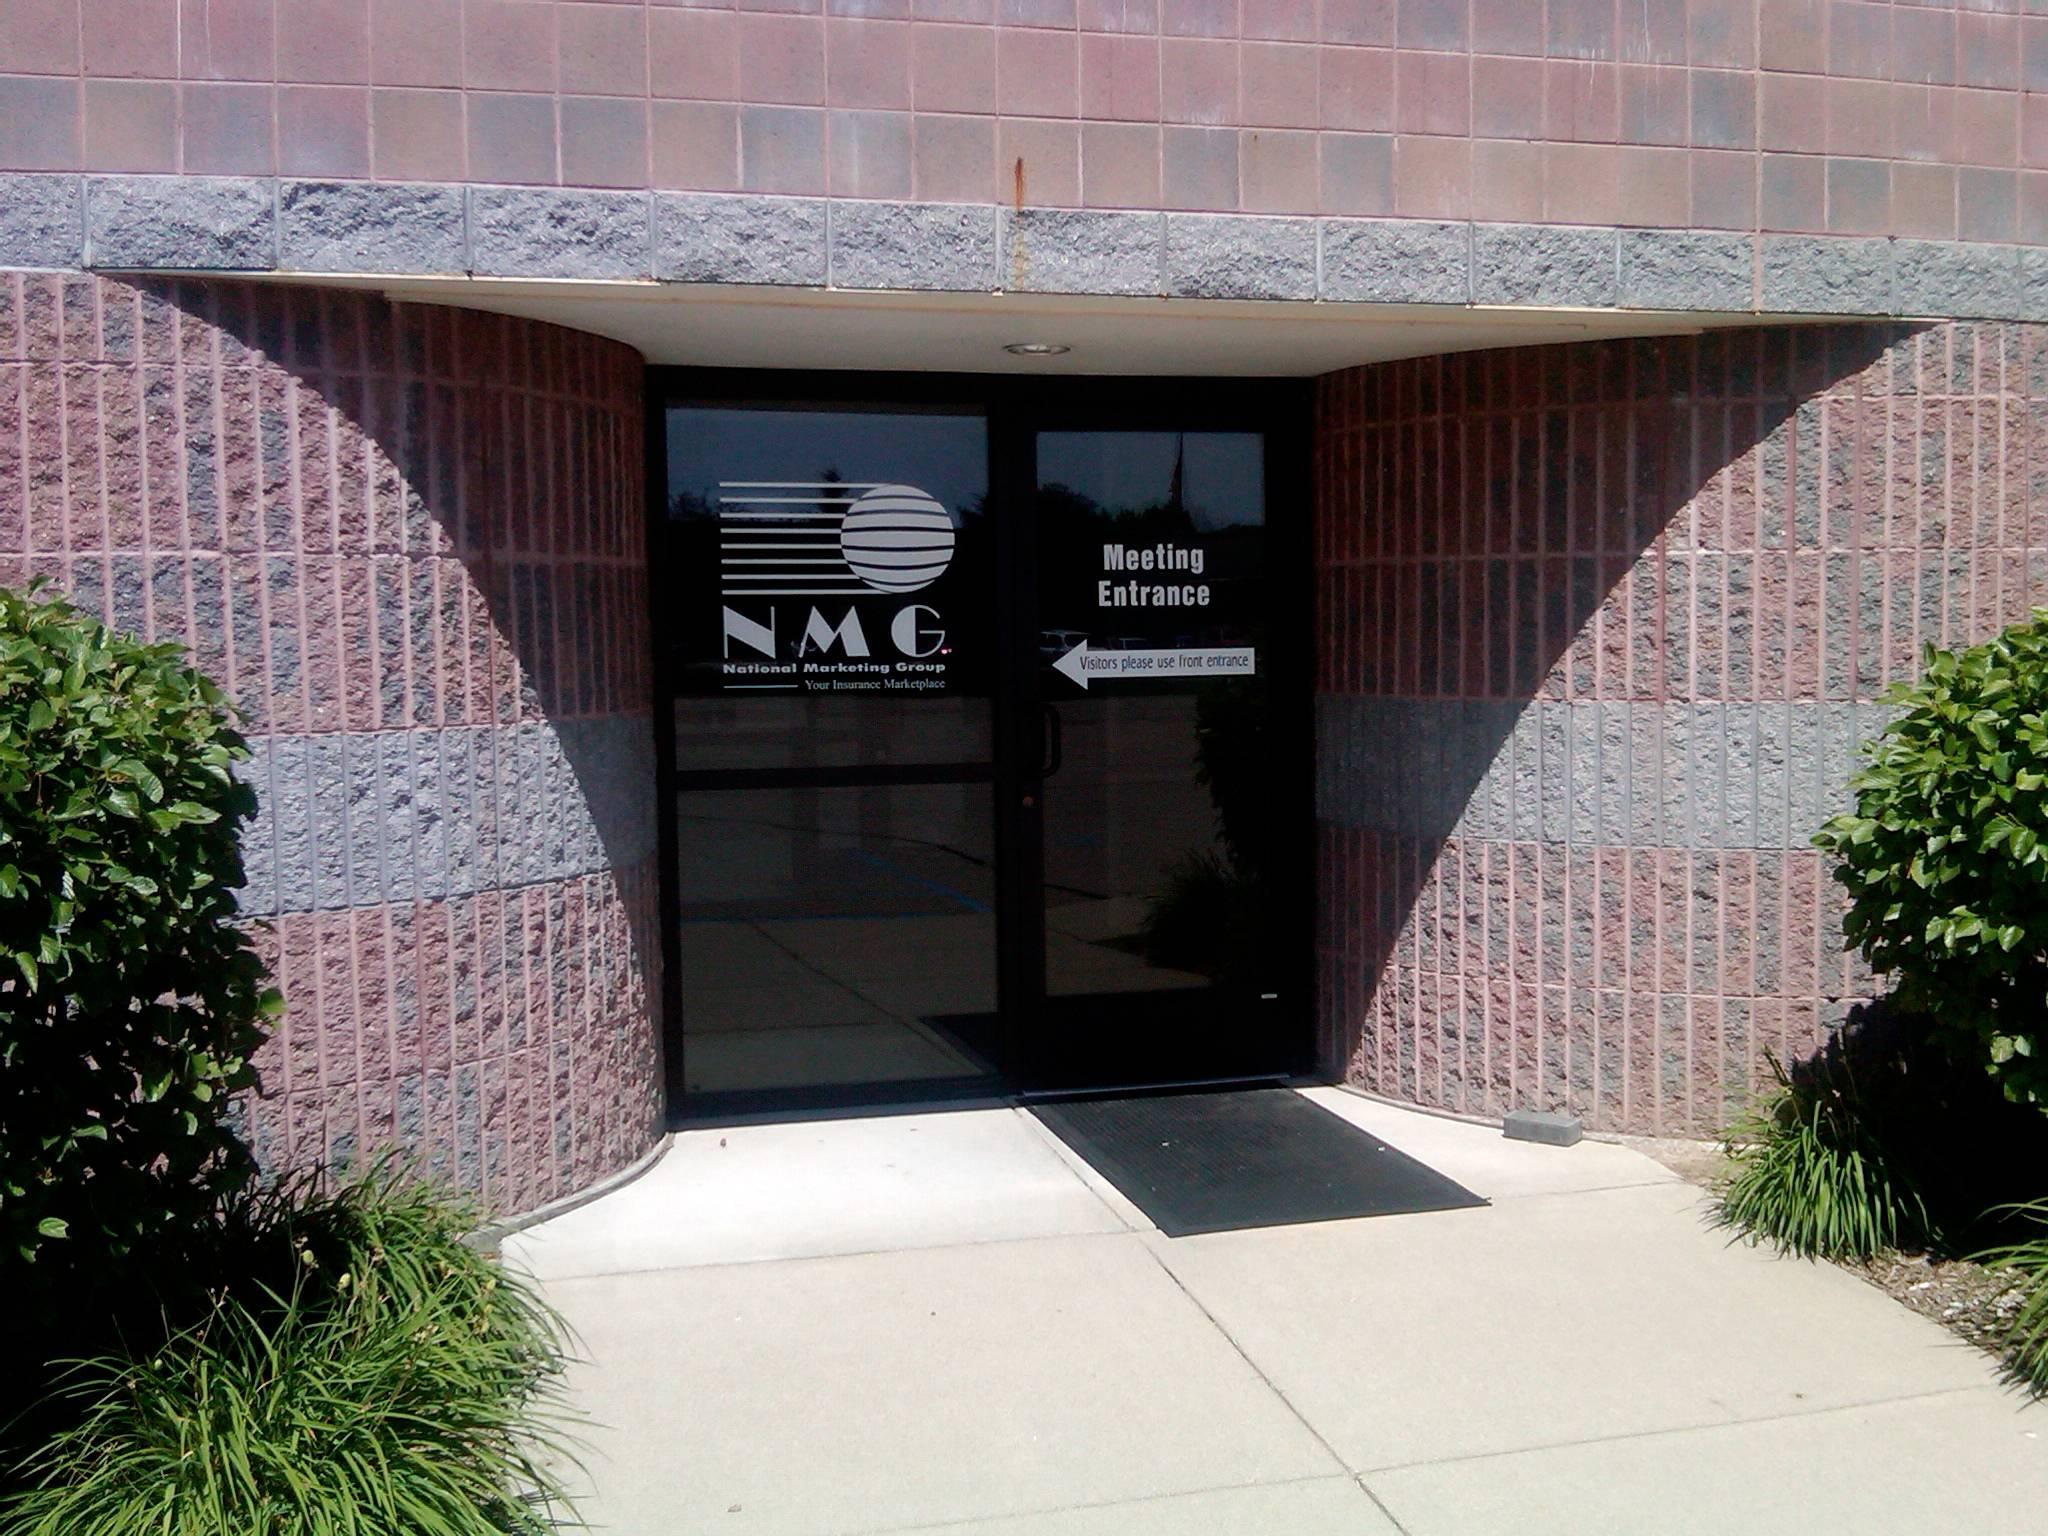 National Marketing Group Inc., 3060 South Dye Rd., Flint,, MI, 48507